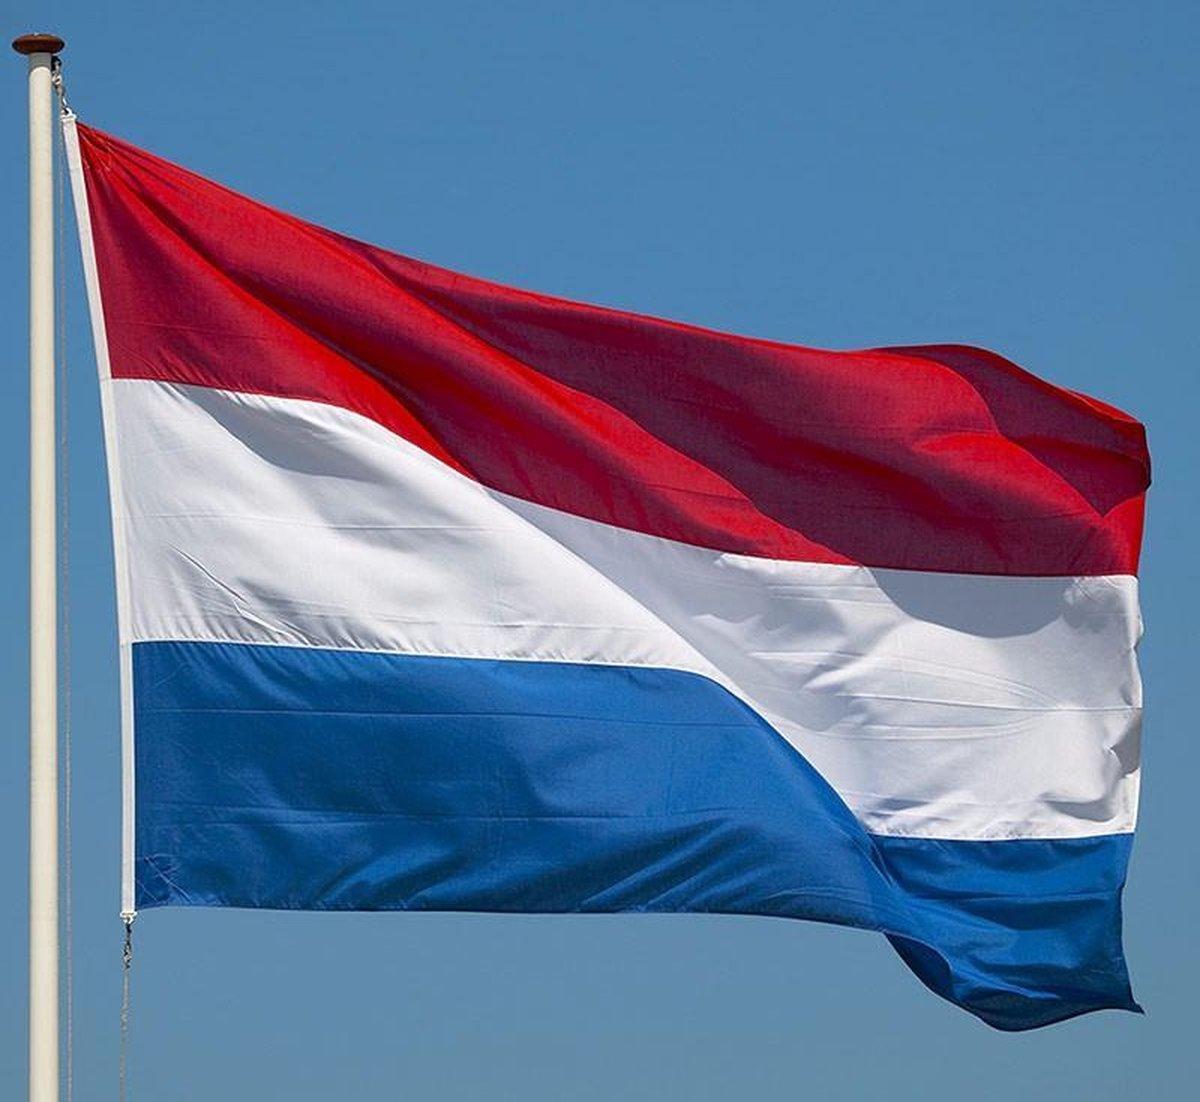 Grote Nederlandse vlag 150x90cm   Hollandse driekleur